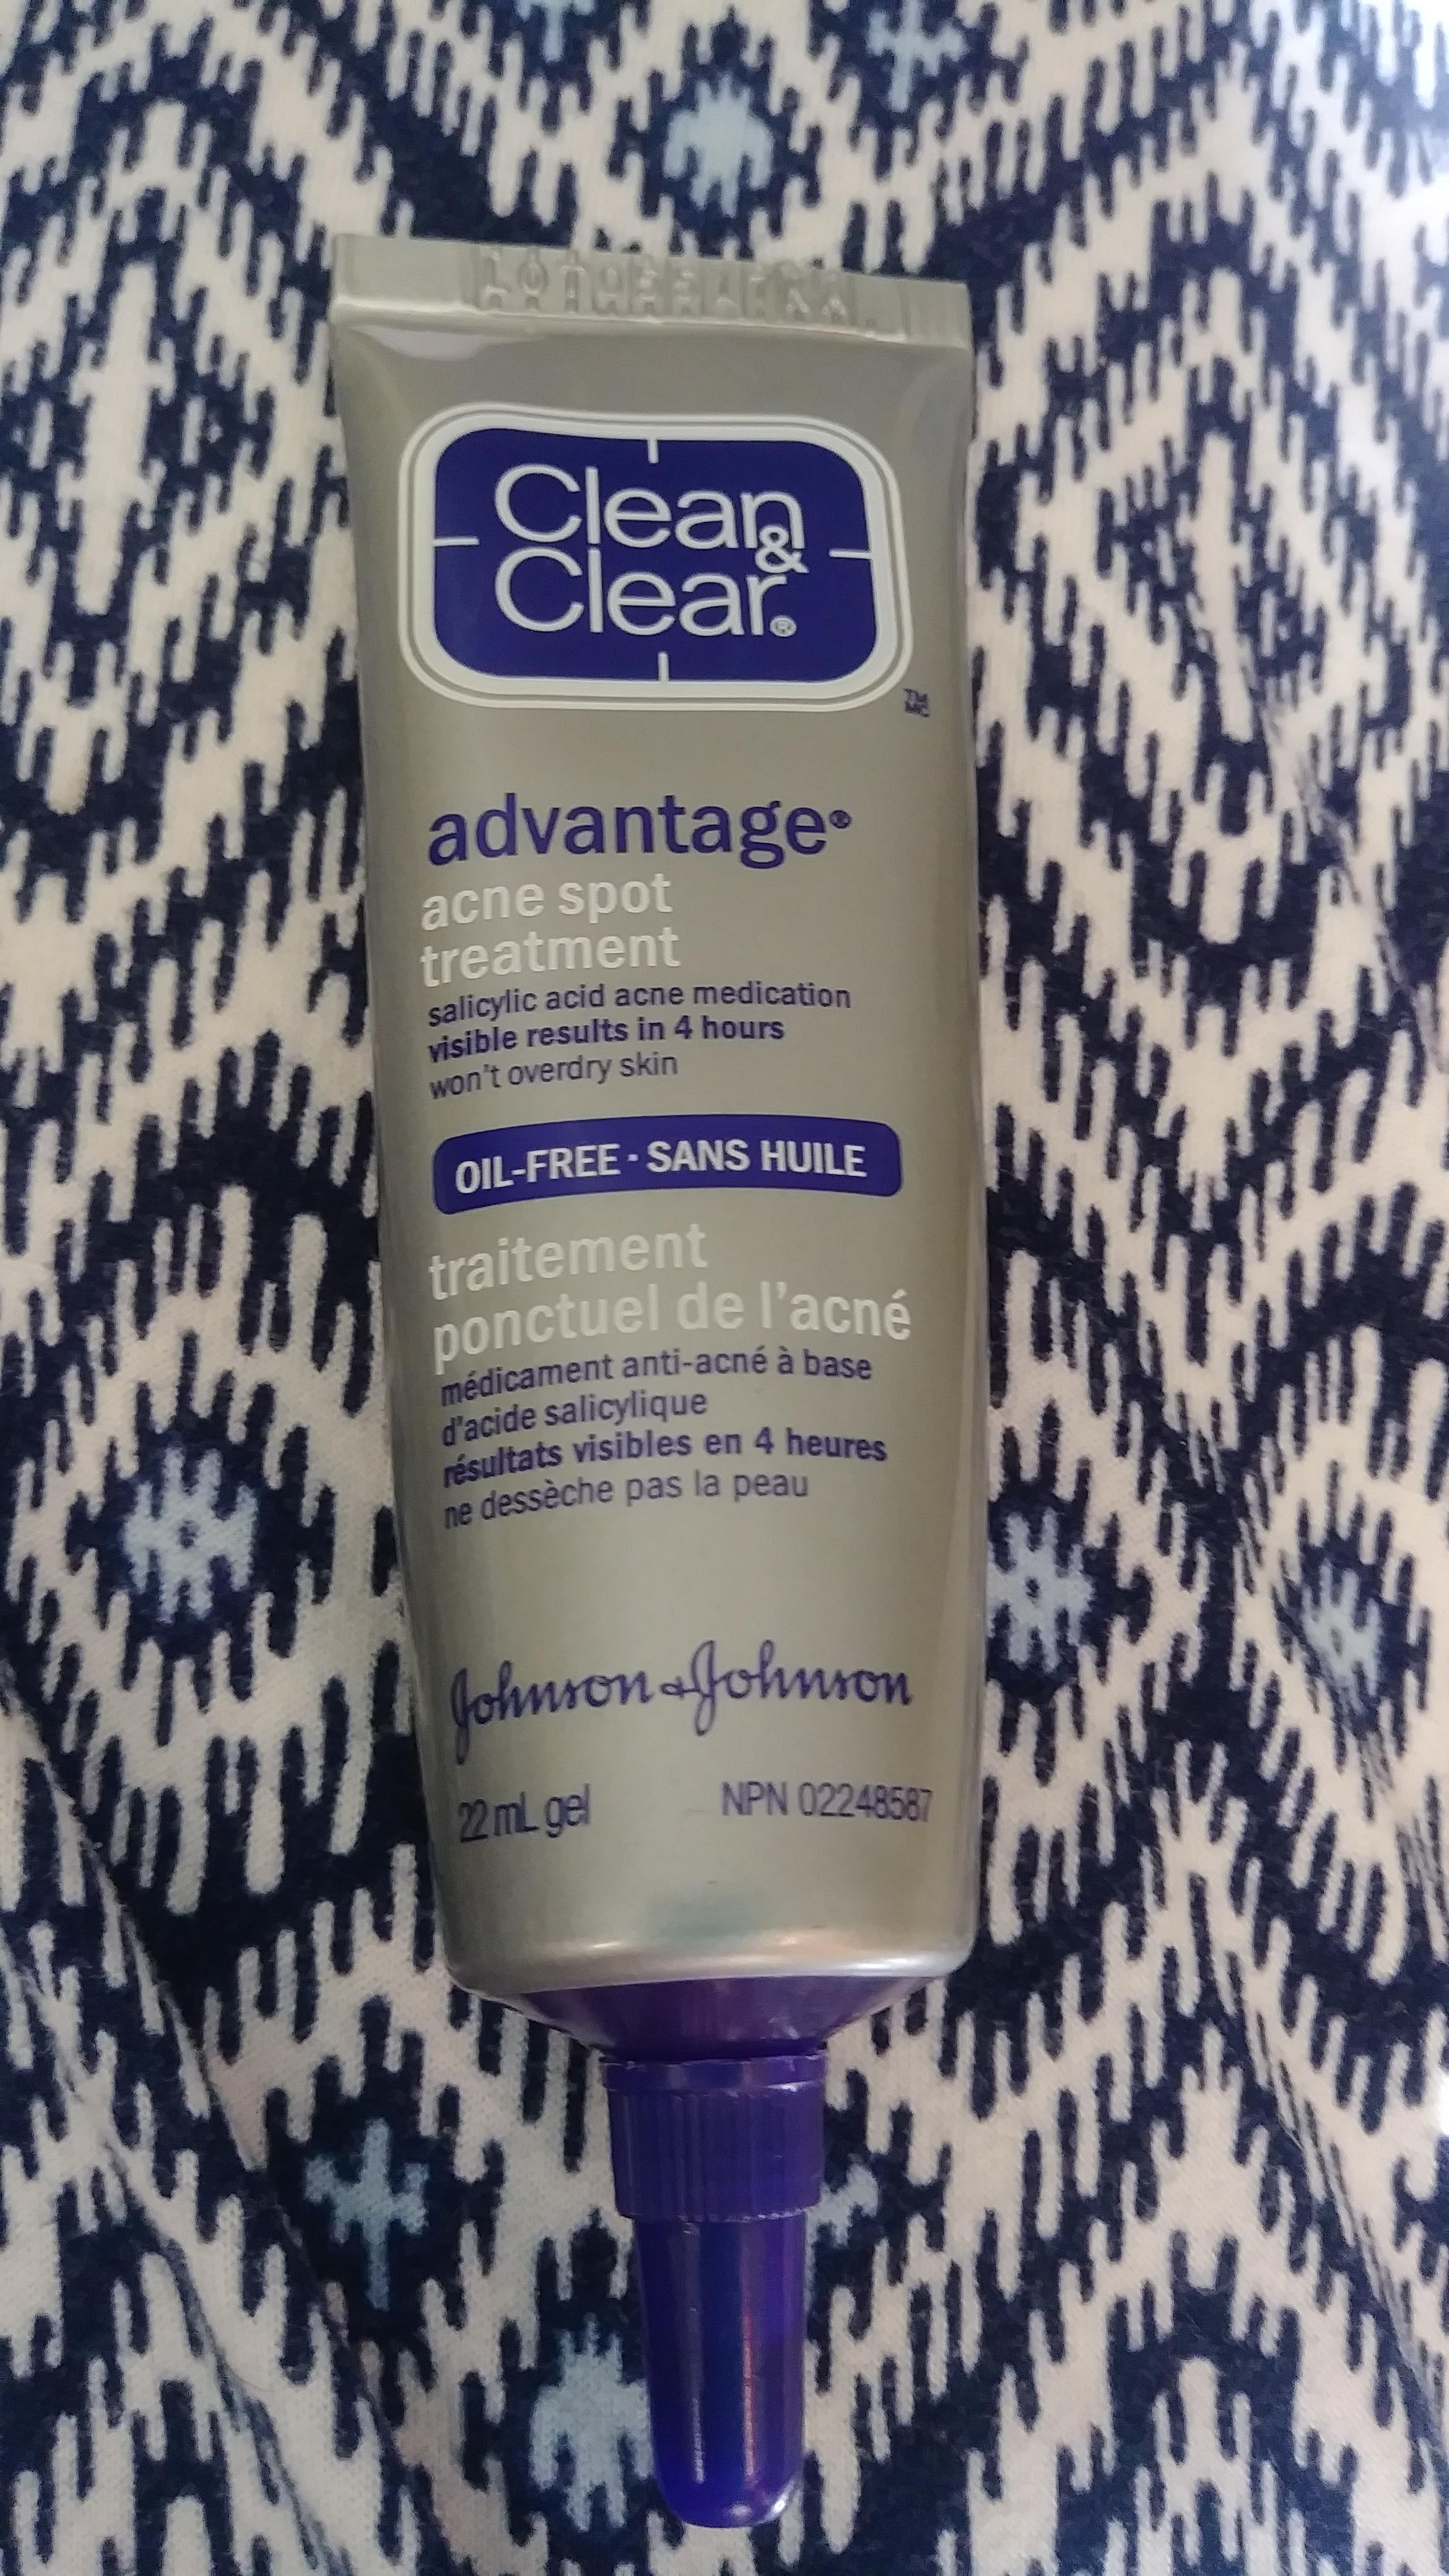 Clean Clear Advantage Acne Spot Treatment Reviews In Blemish Acne Treatments Chickadvisor